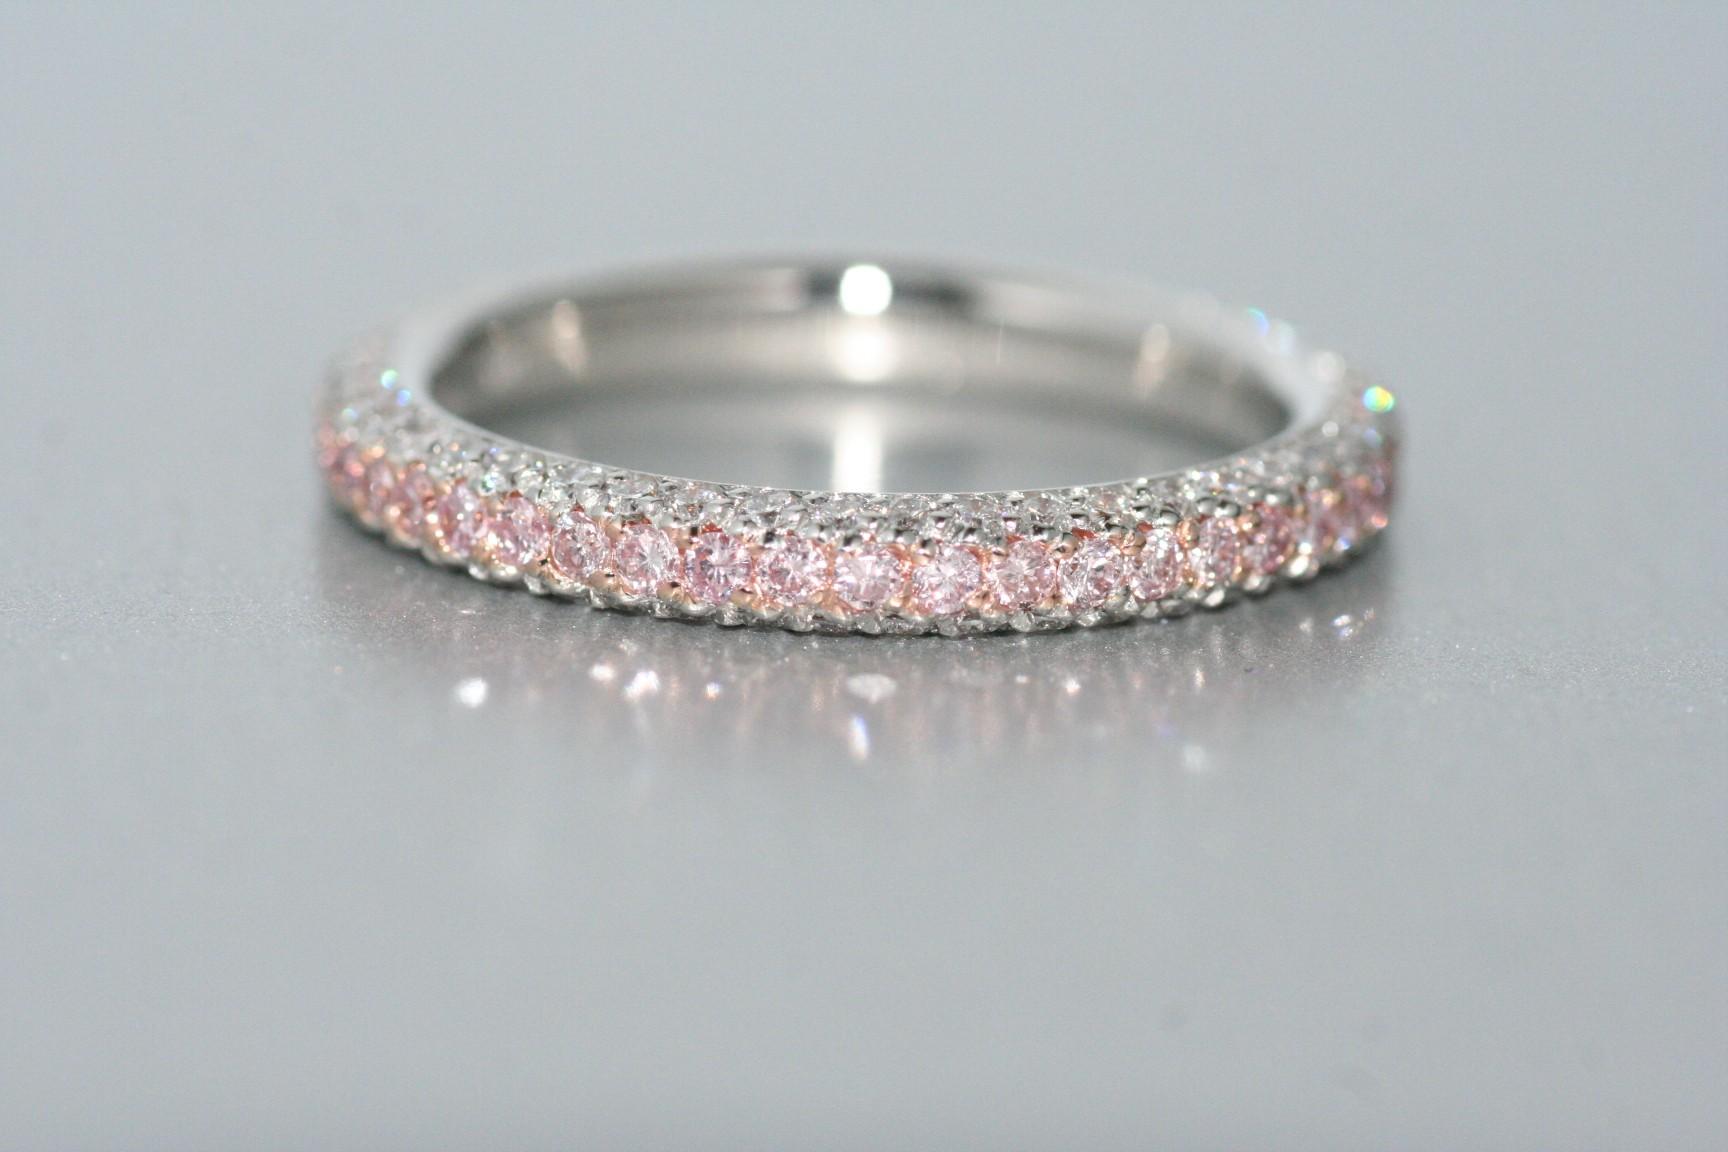 Platinum diamond eternity band with pink and white diamonds.